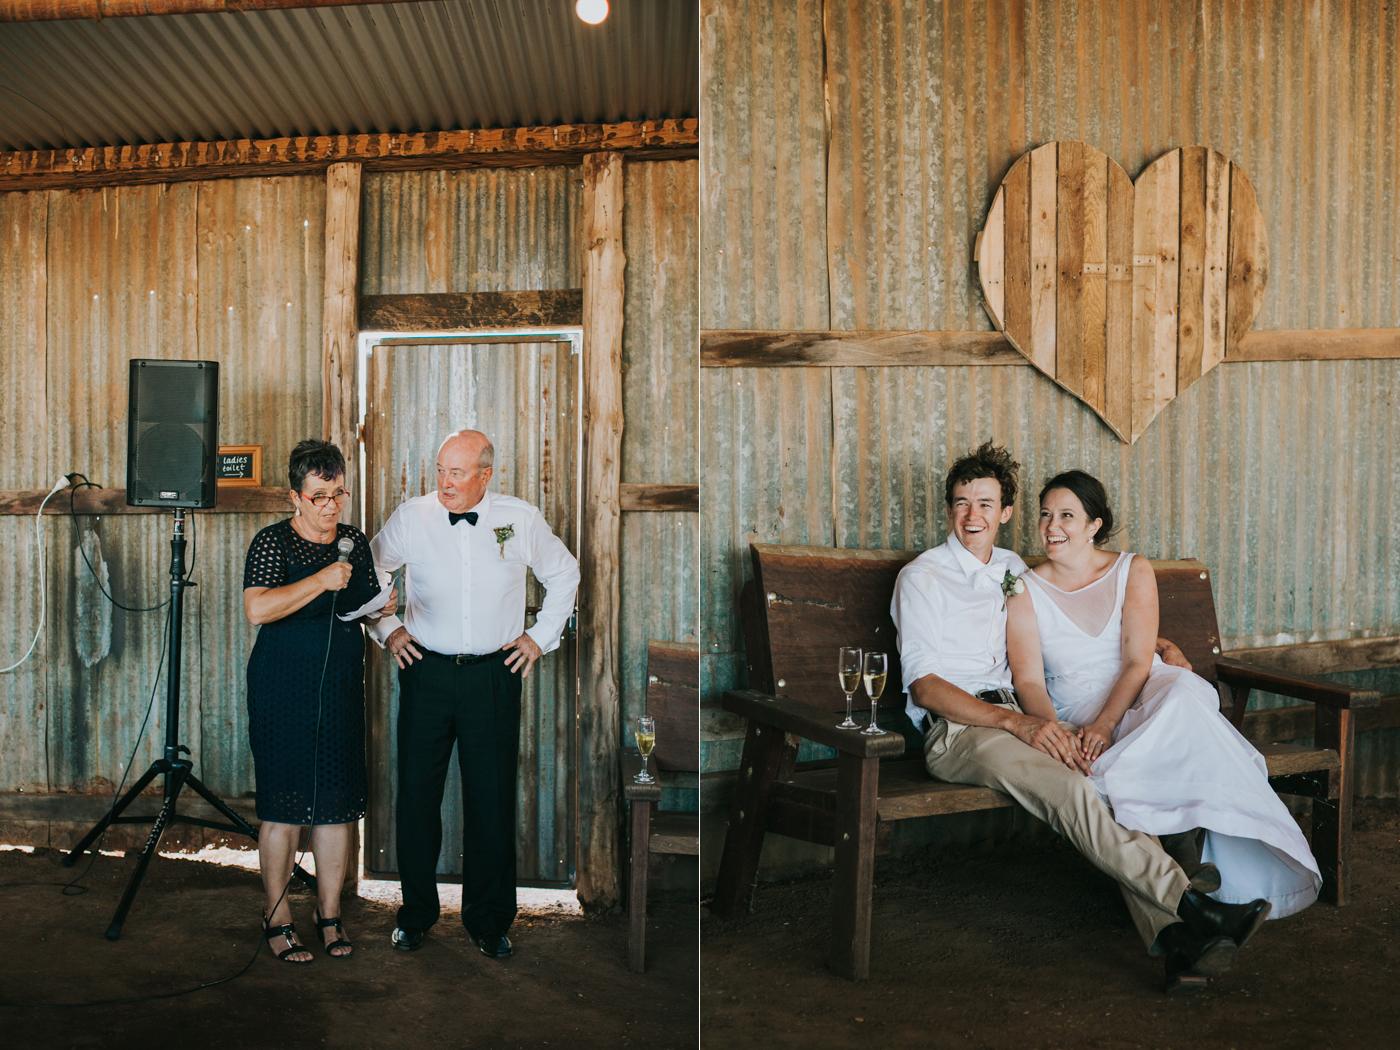 Nicolle & Jacob - Dubbo Wedding - Country Australia - Samantha Heather Photography-227.jpg